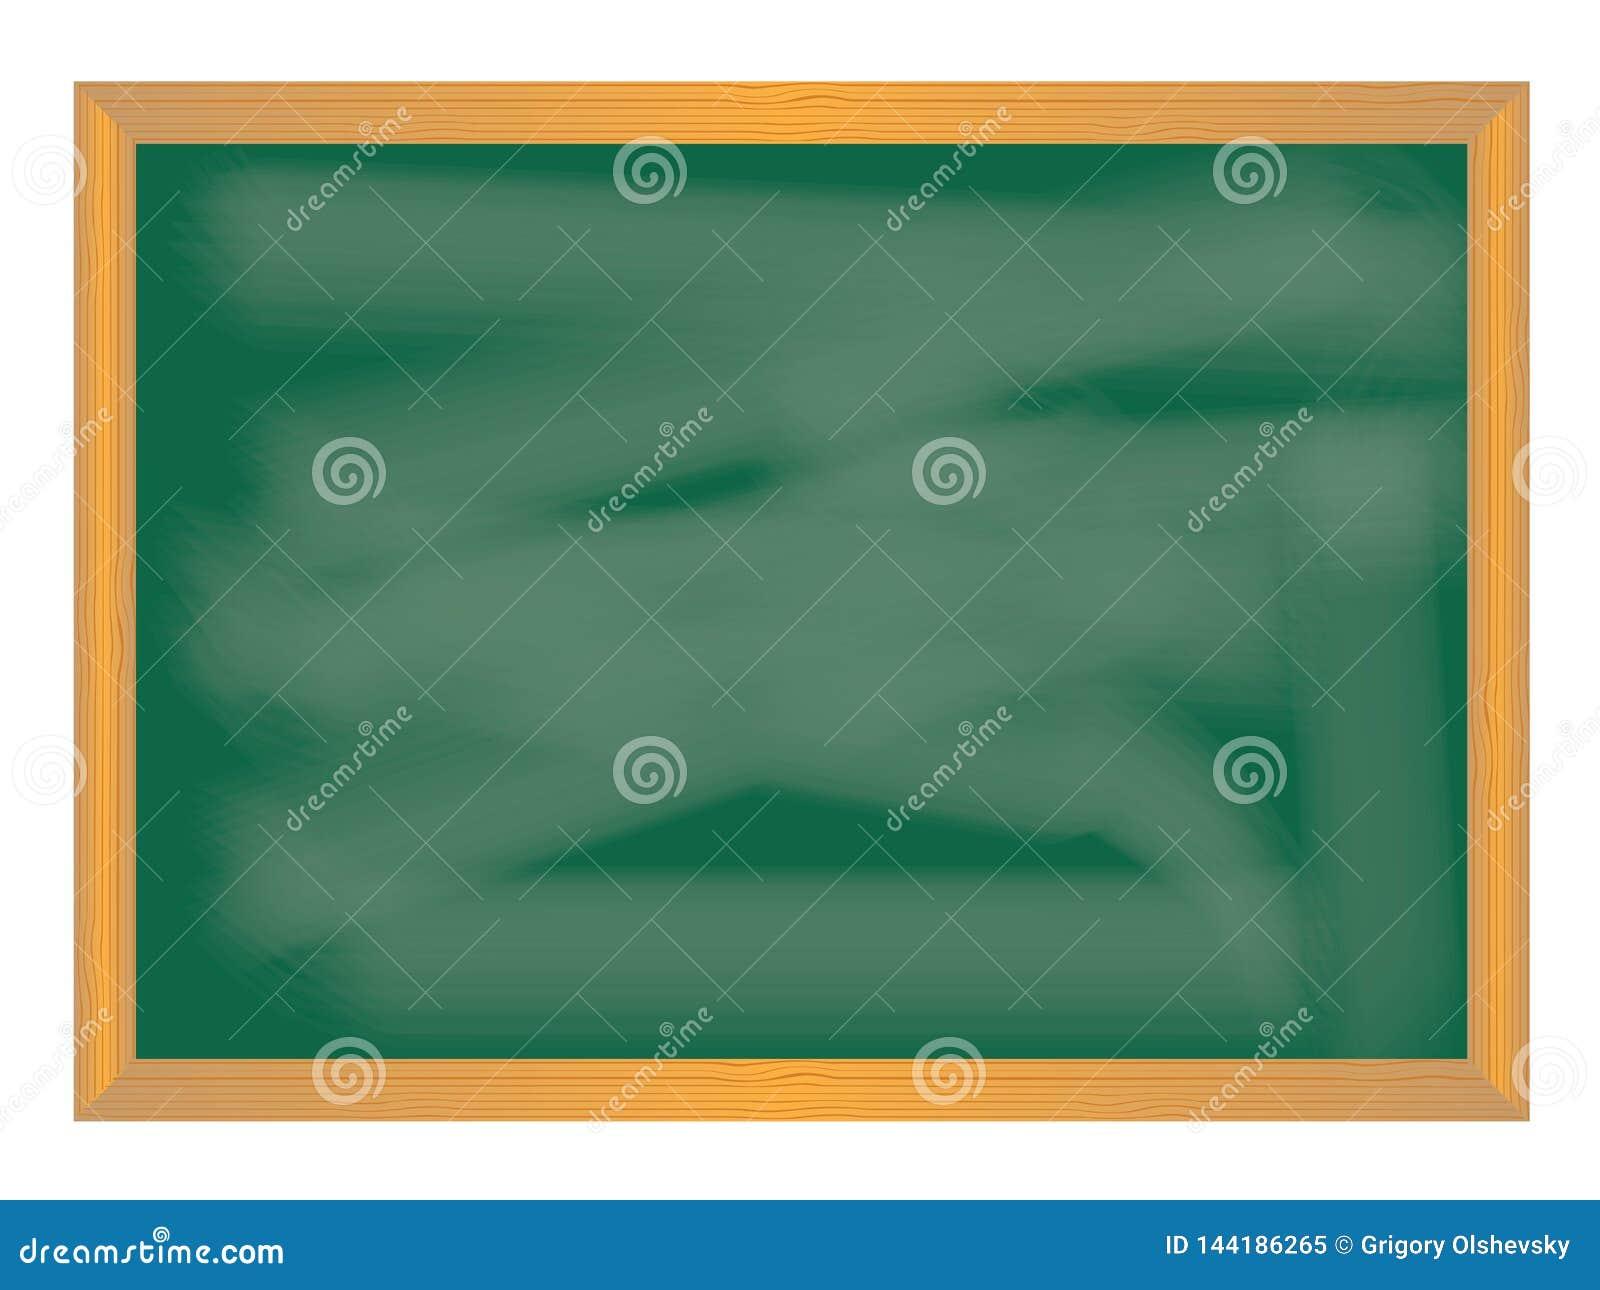 School icons on chalkboard